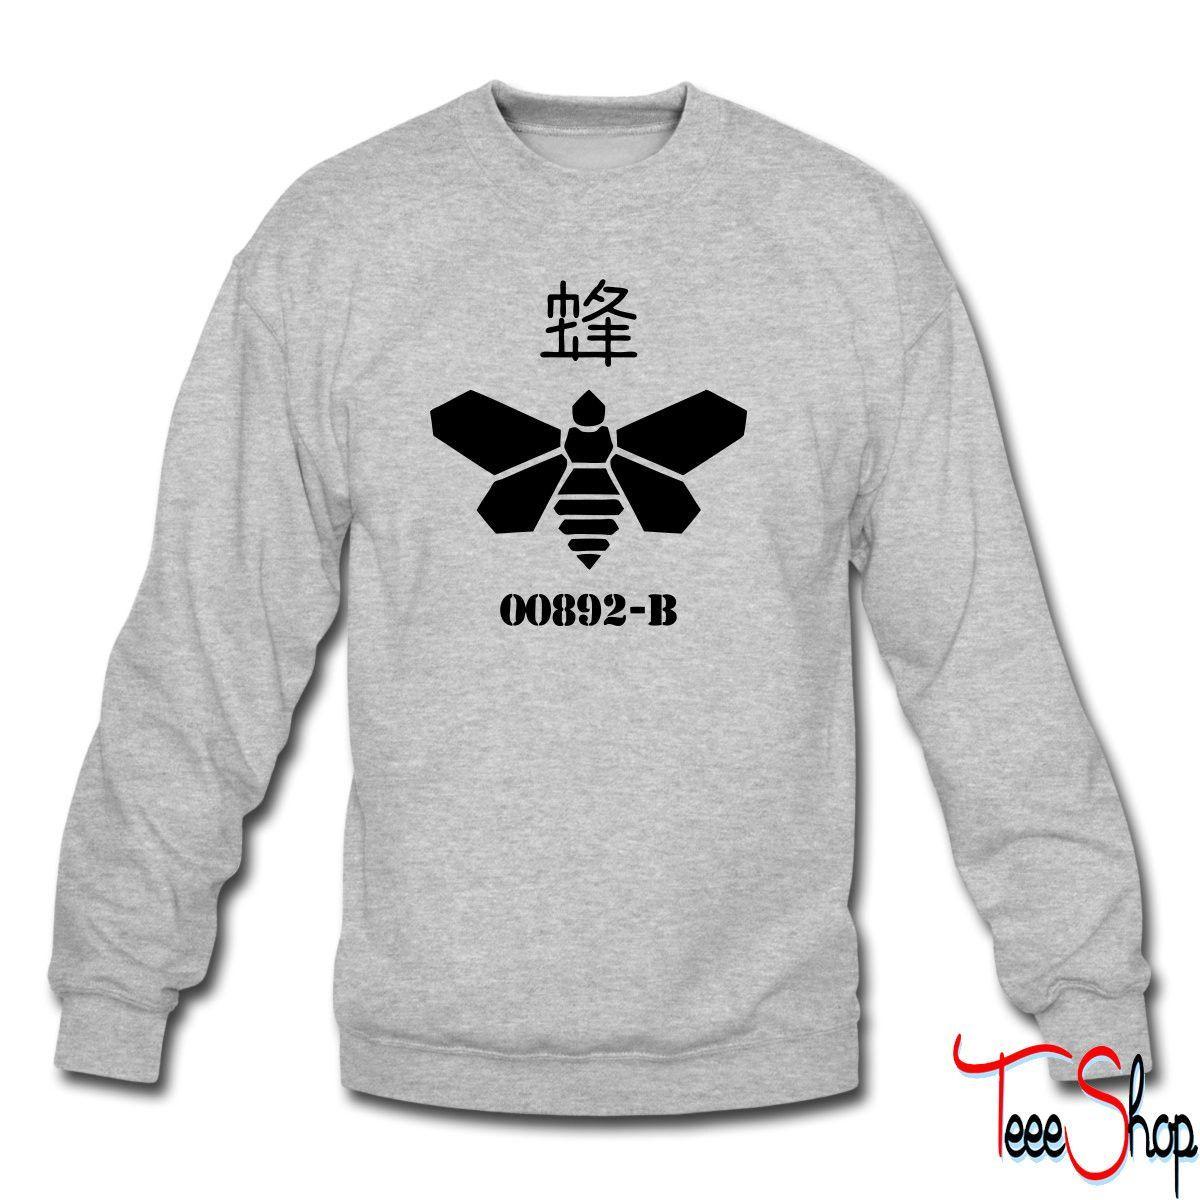 Bee Barrel sweatshirt